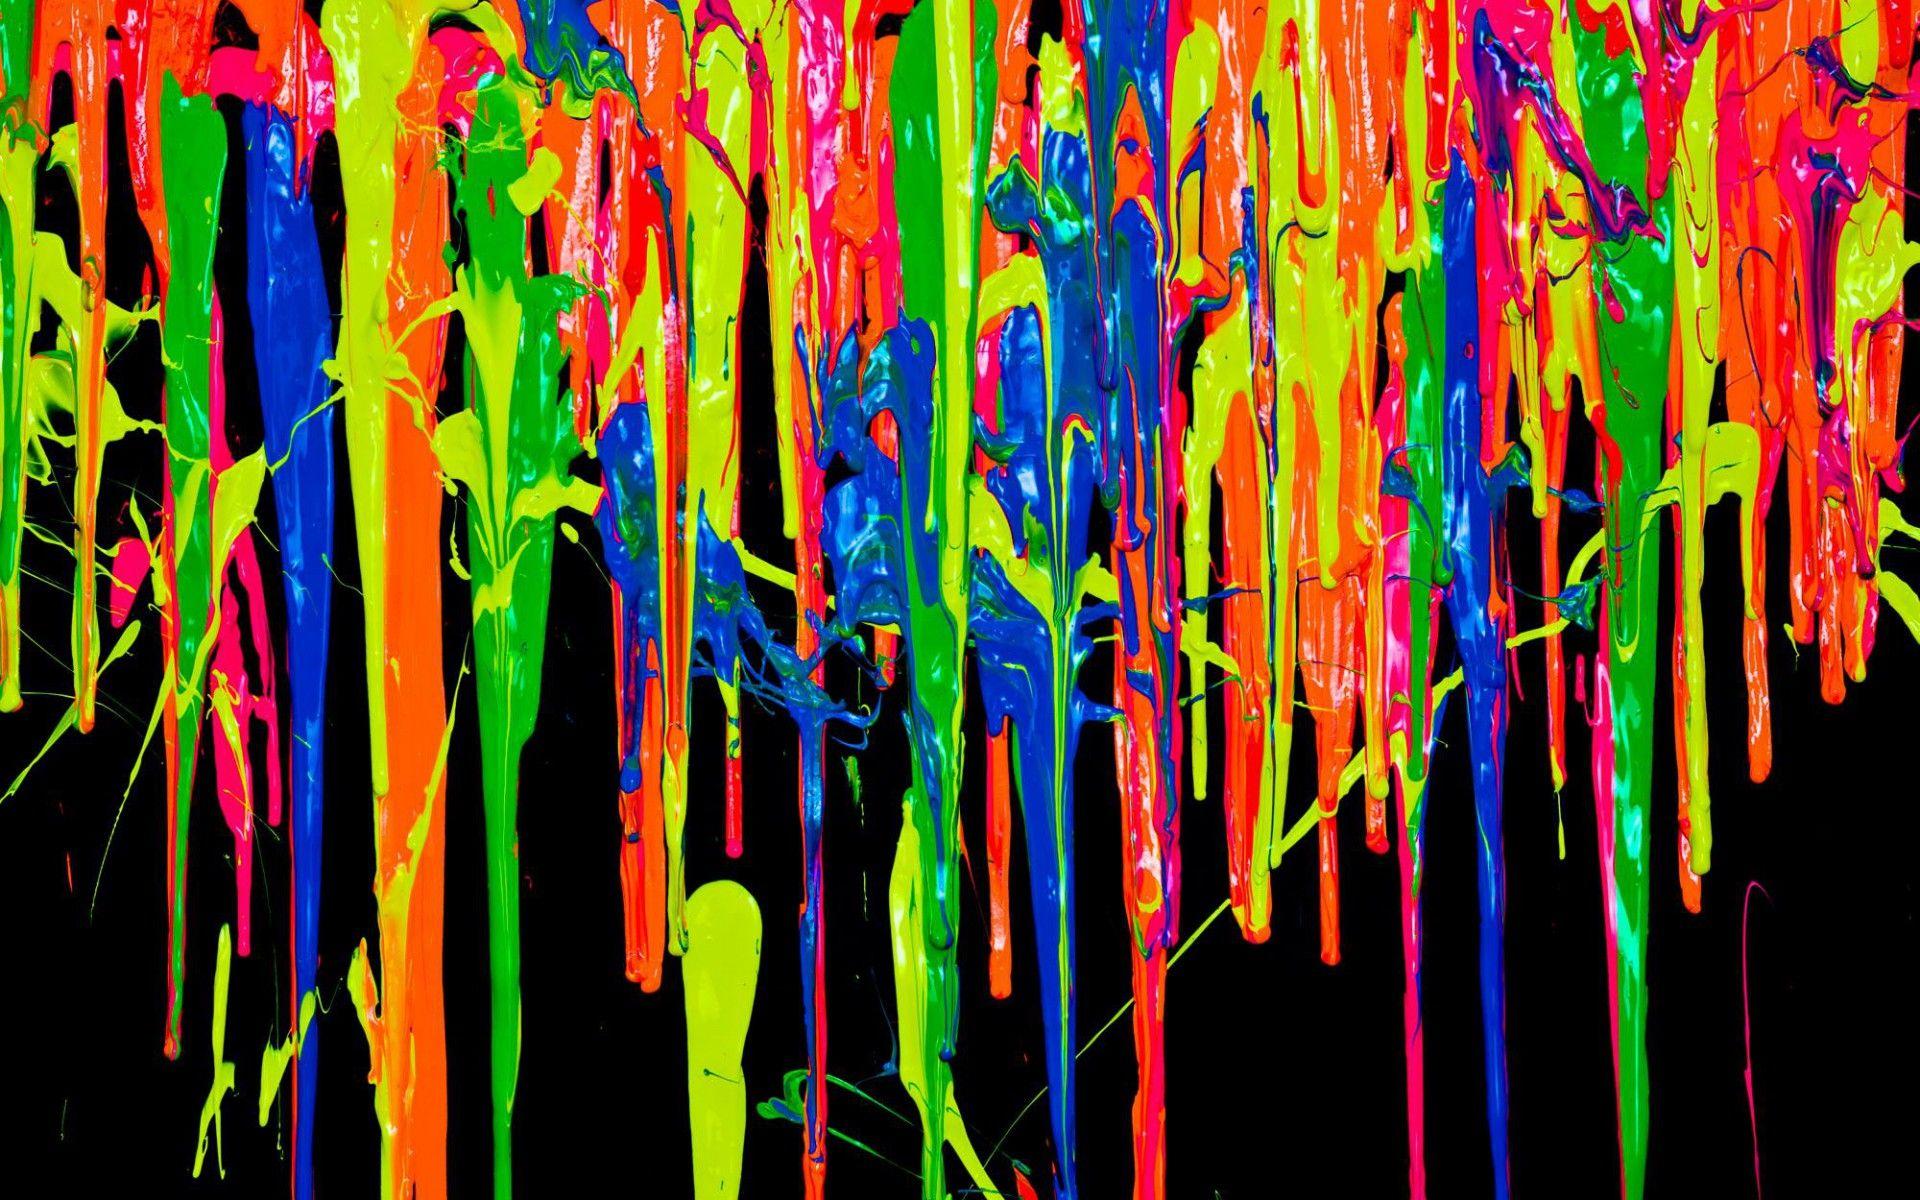 Trippy Hd Wallpapers 1080p Wallpaper Trippy Wallpaper Painting Wallpaper Art Background